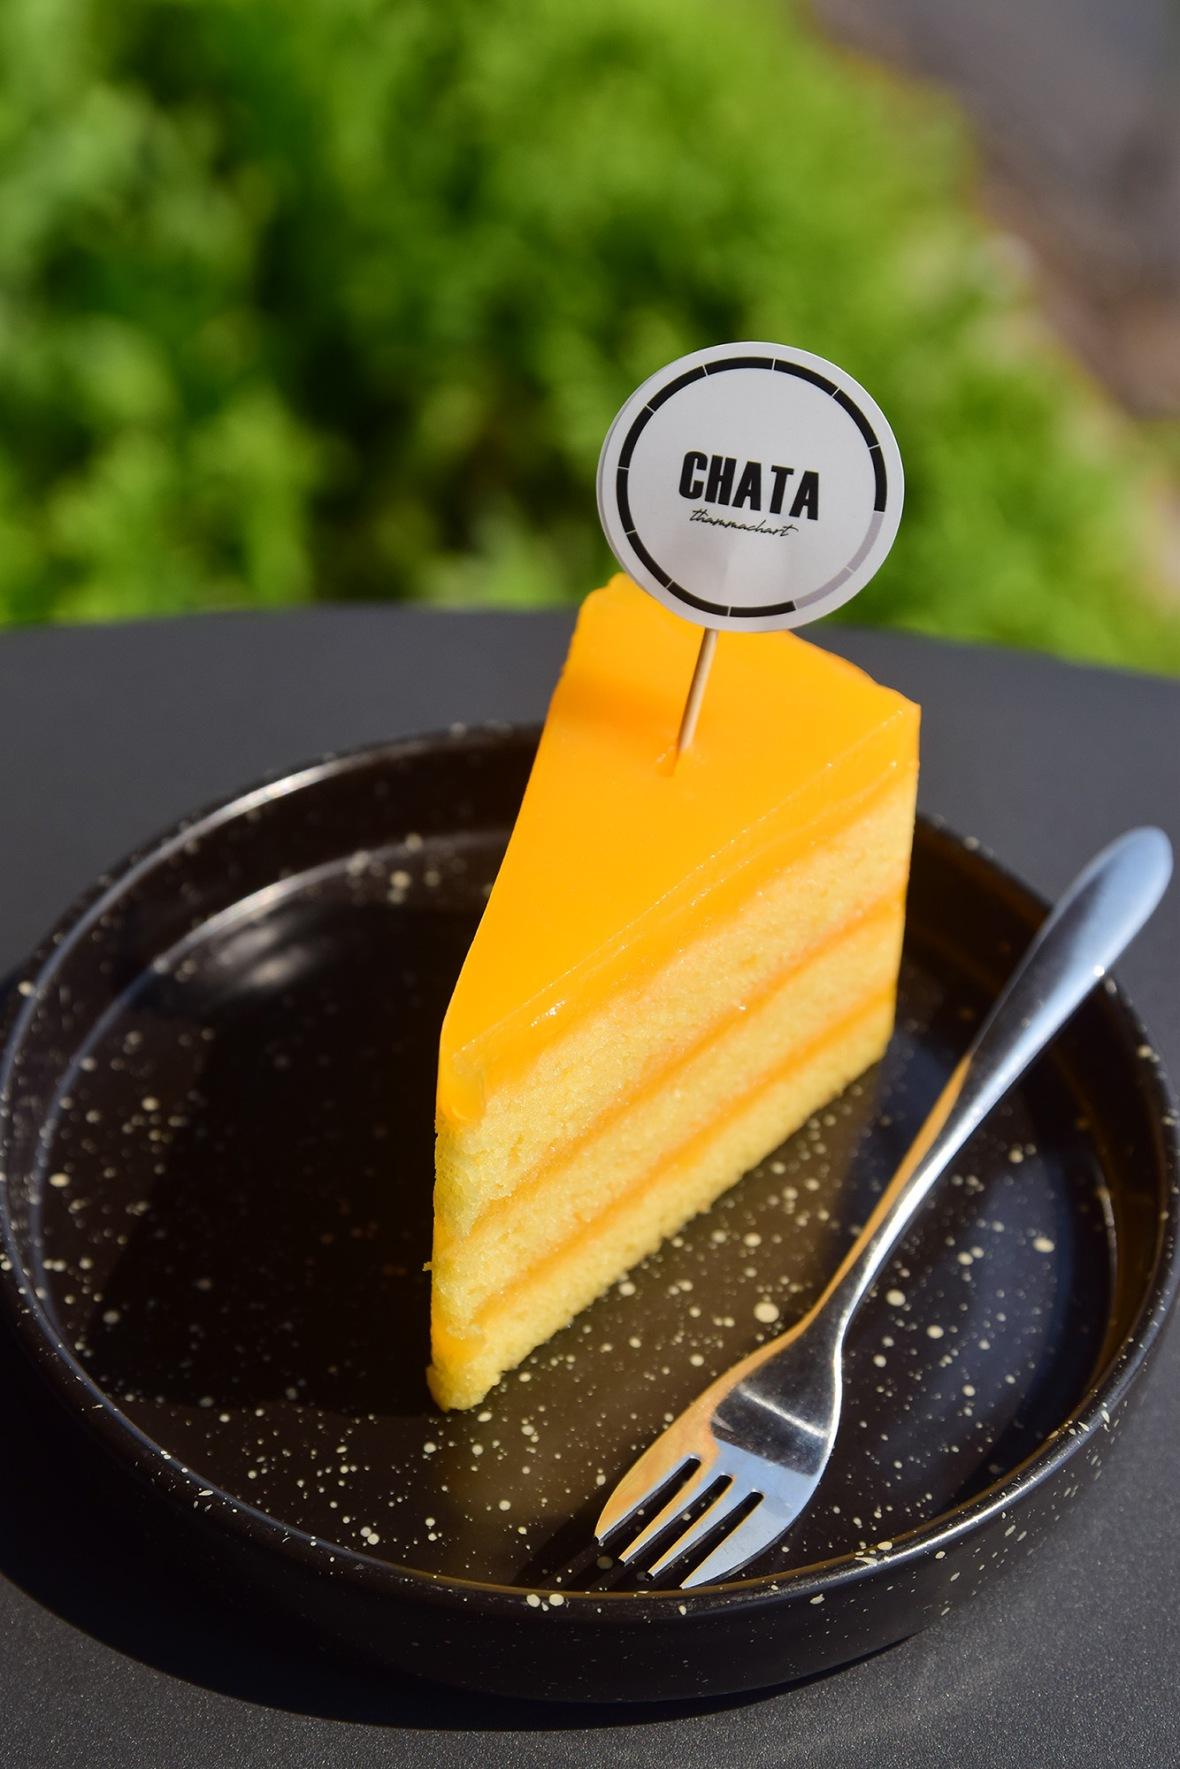 Chata thammachart Cafe&Bistro (41)